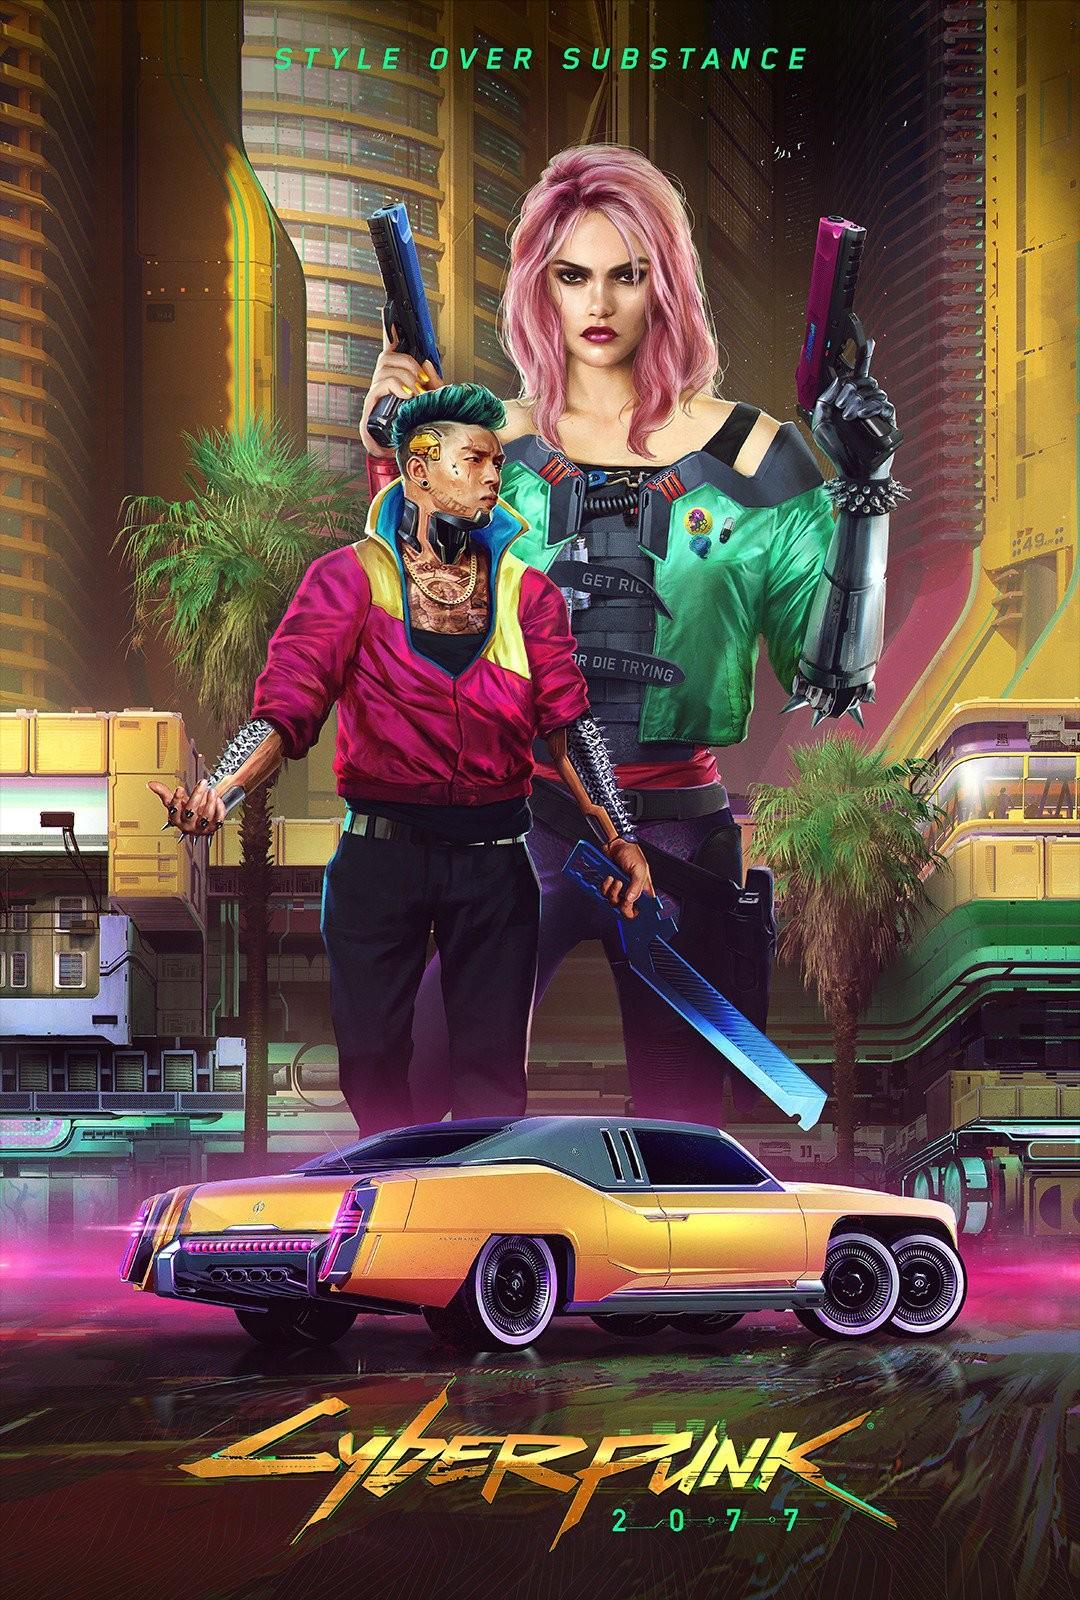 Постер - Cyberpunk 2077